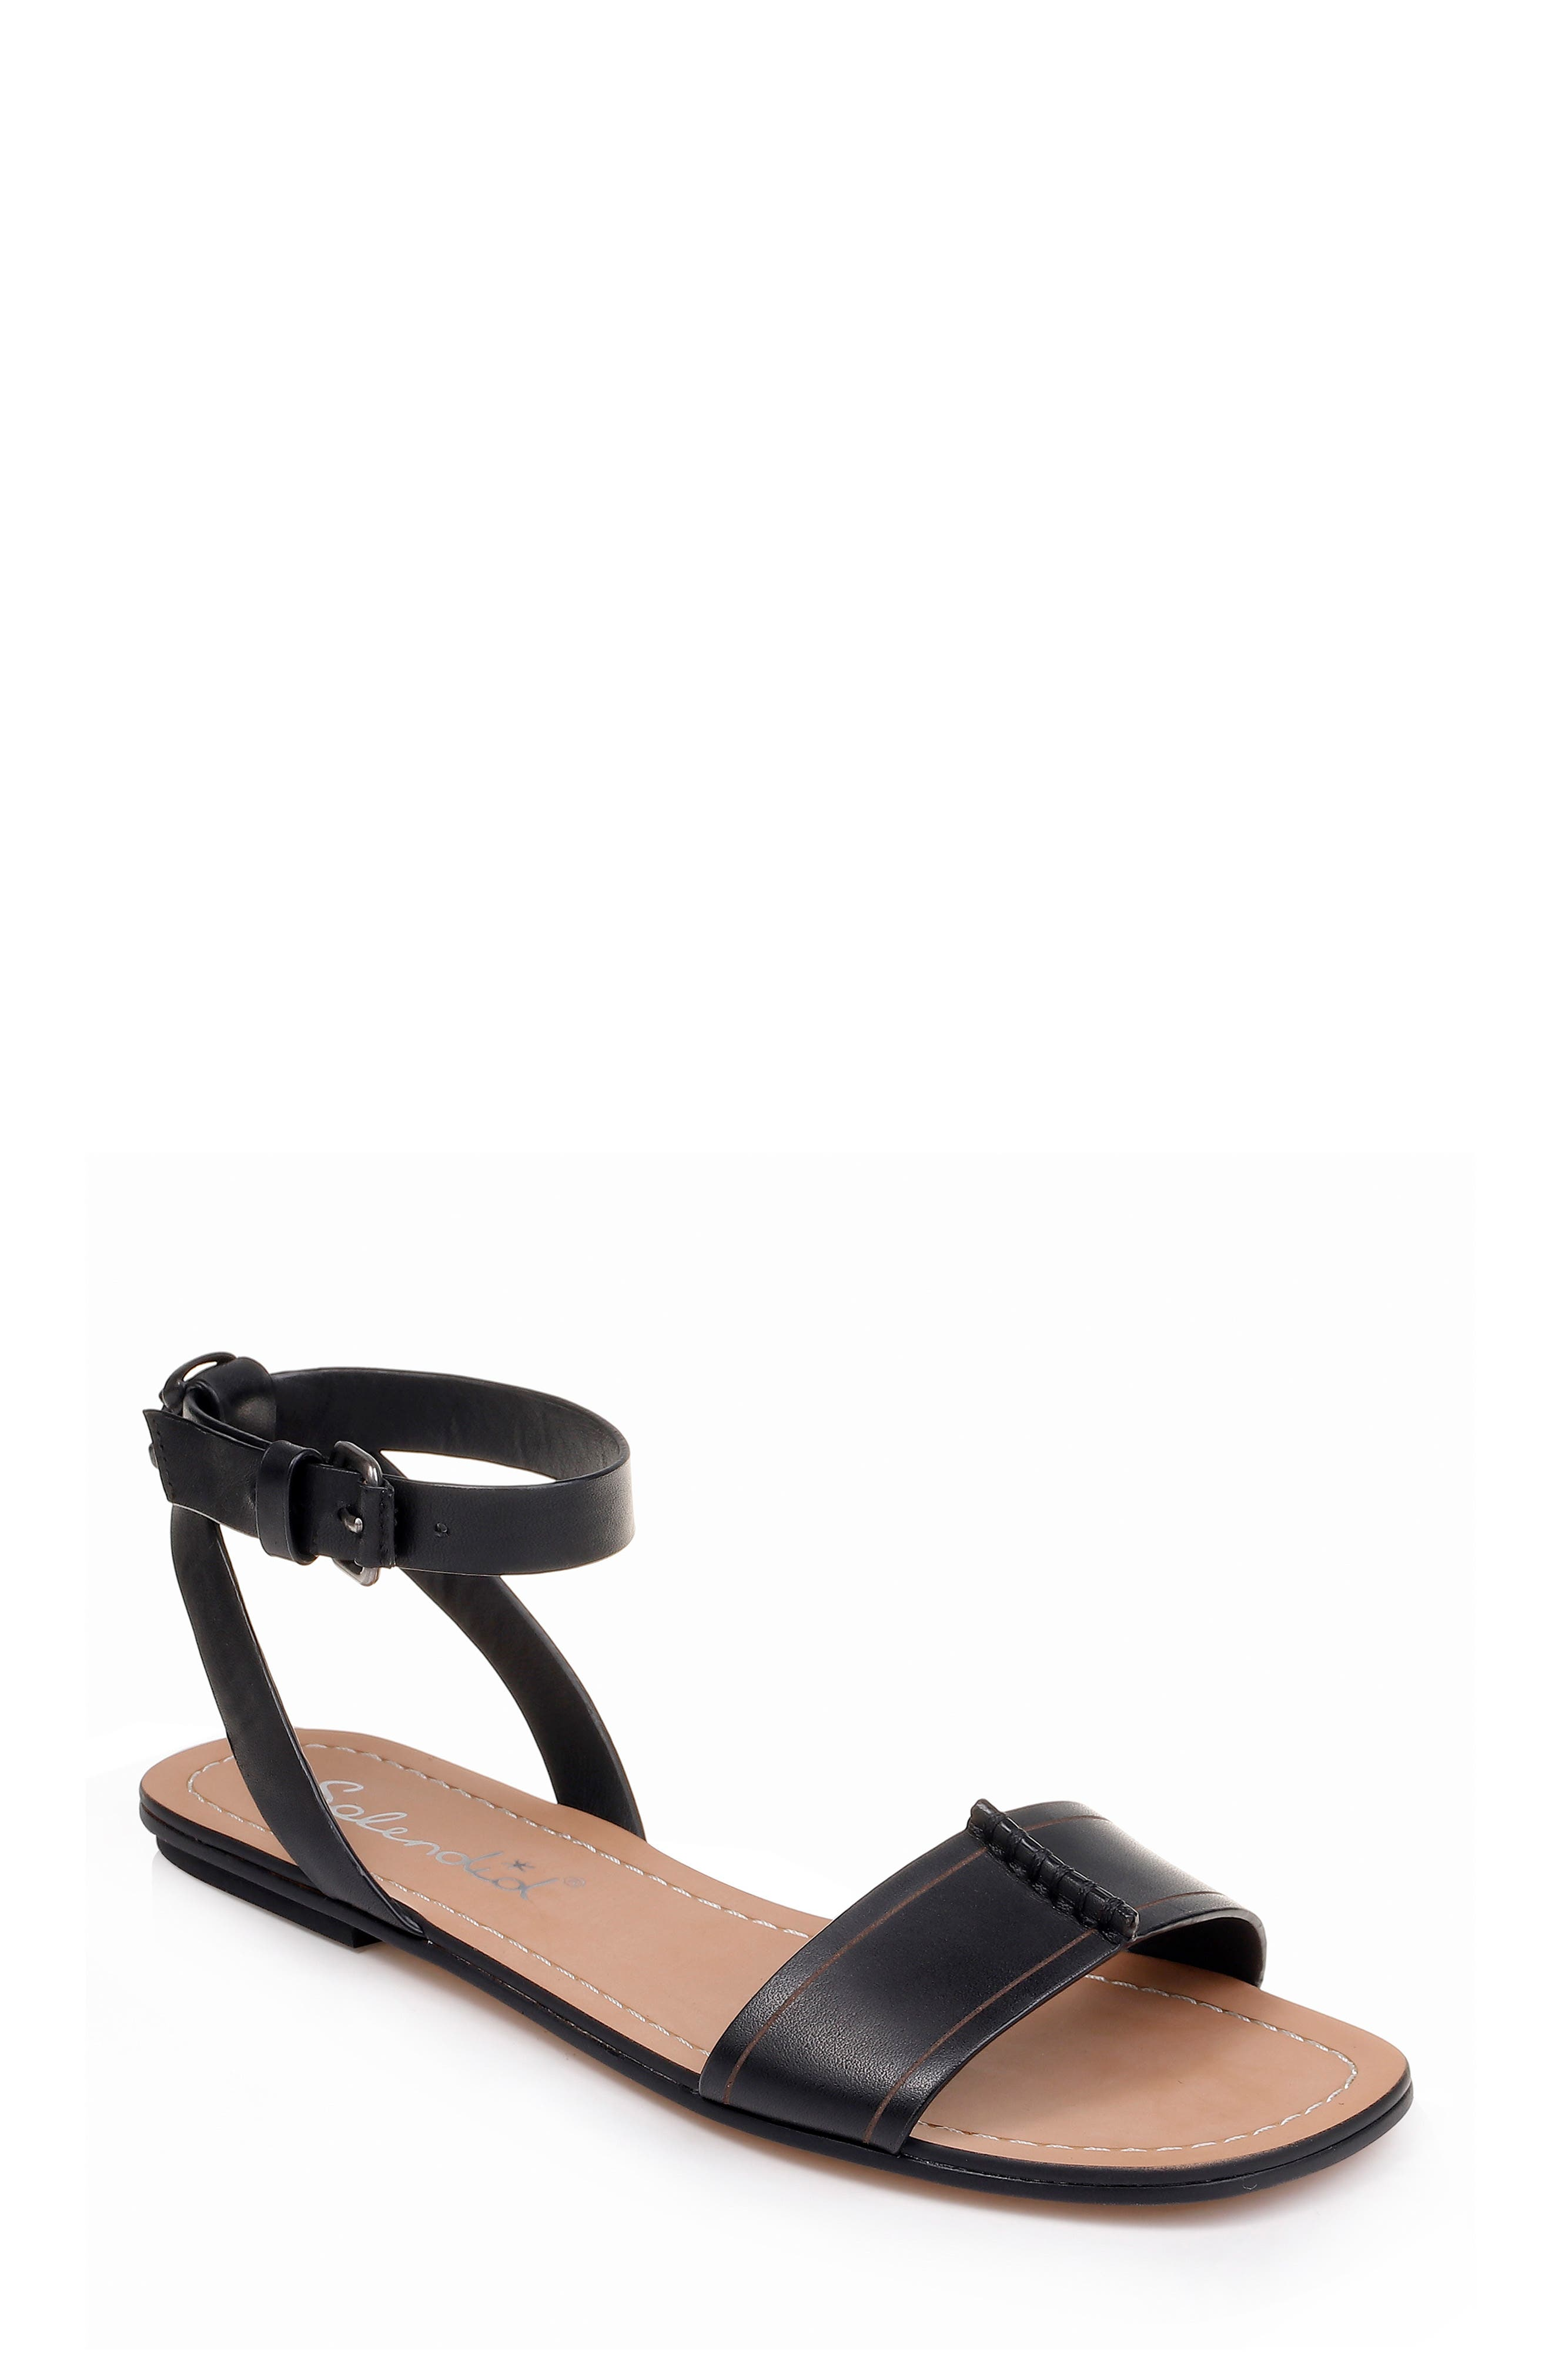 SPLENDID Tabitha Ankle Strap Flat Sandal, Main, color, BLACK LEATHER